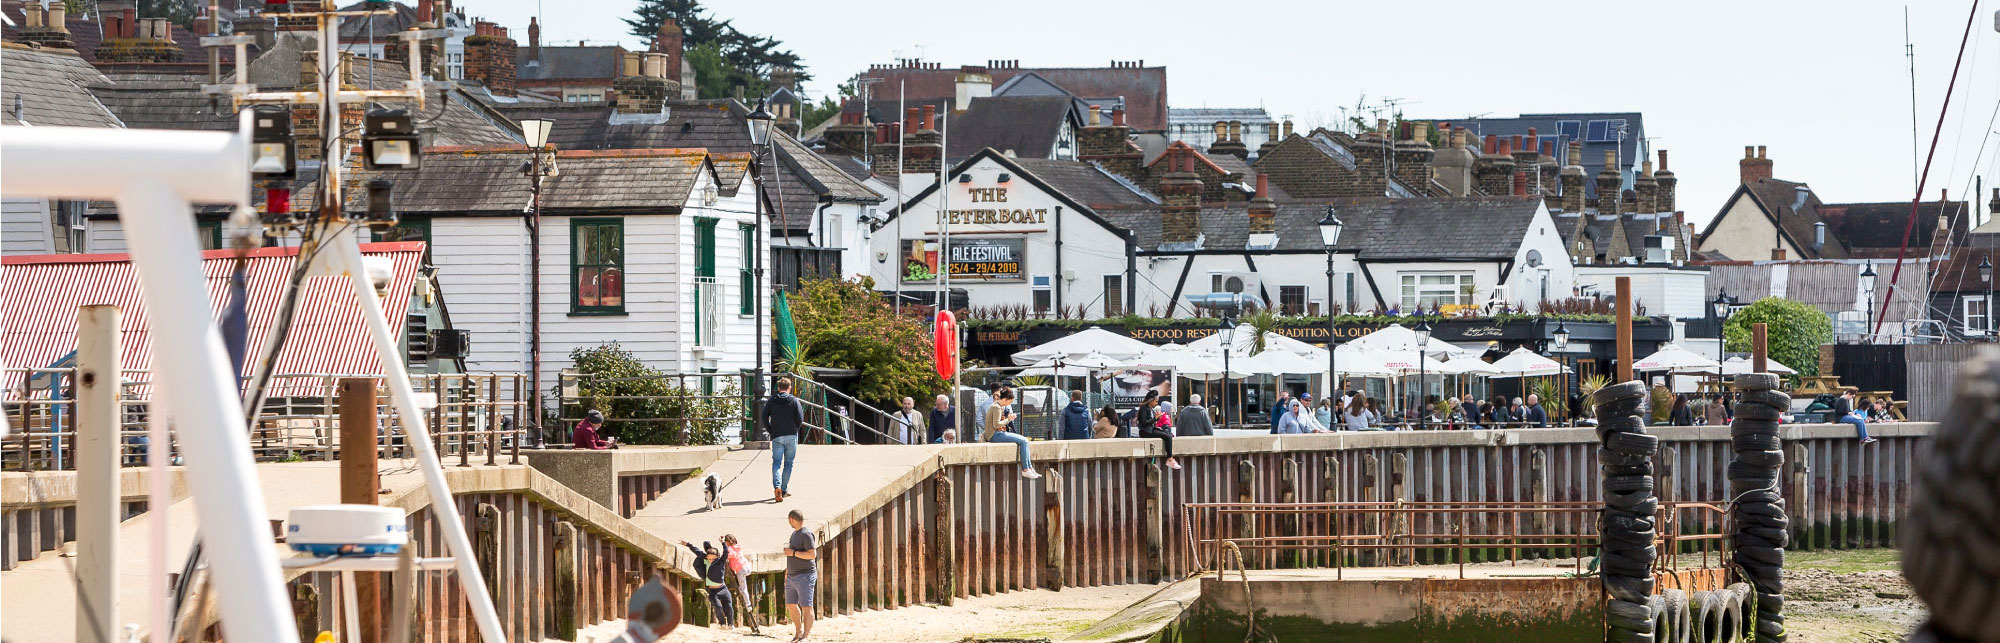 The Peterboat, Leigh-on-Sea | East Anglia Pub Co